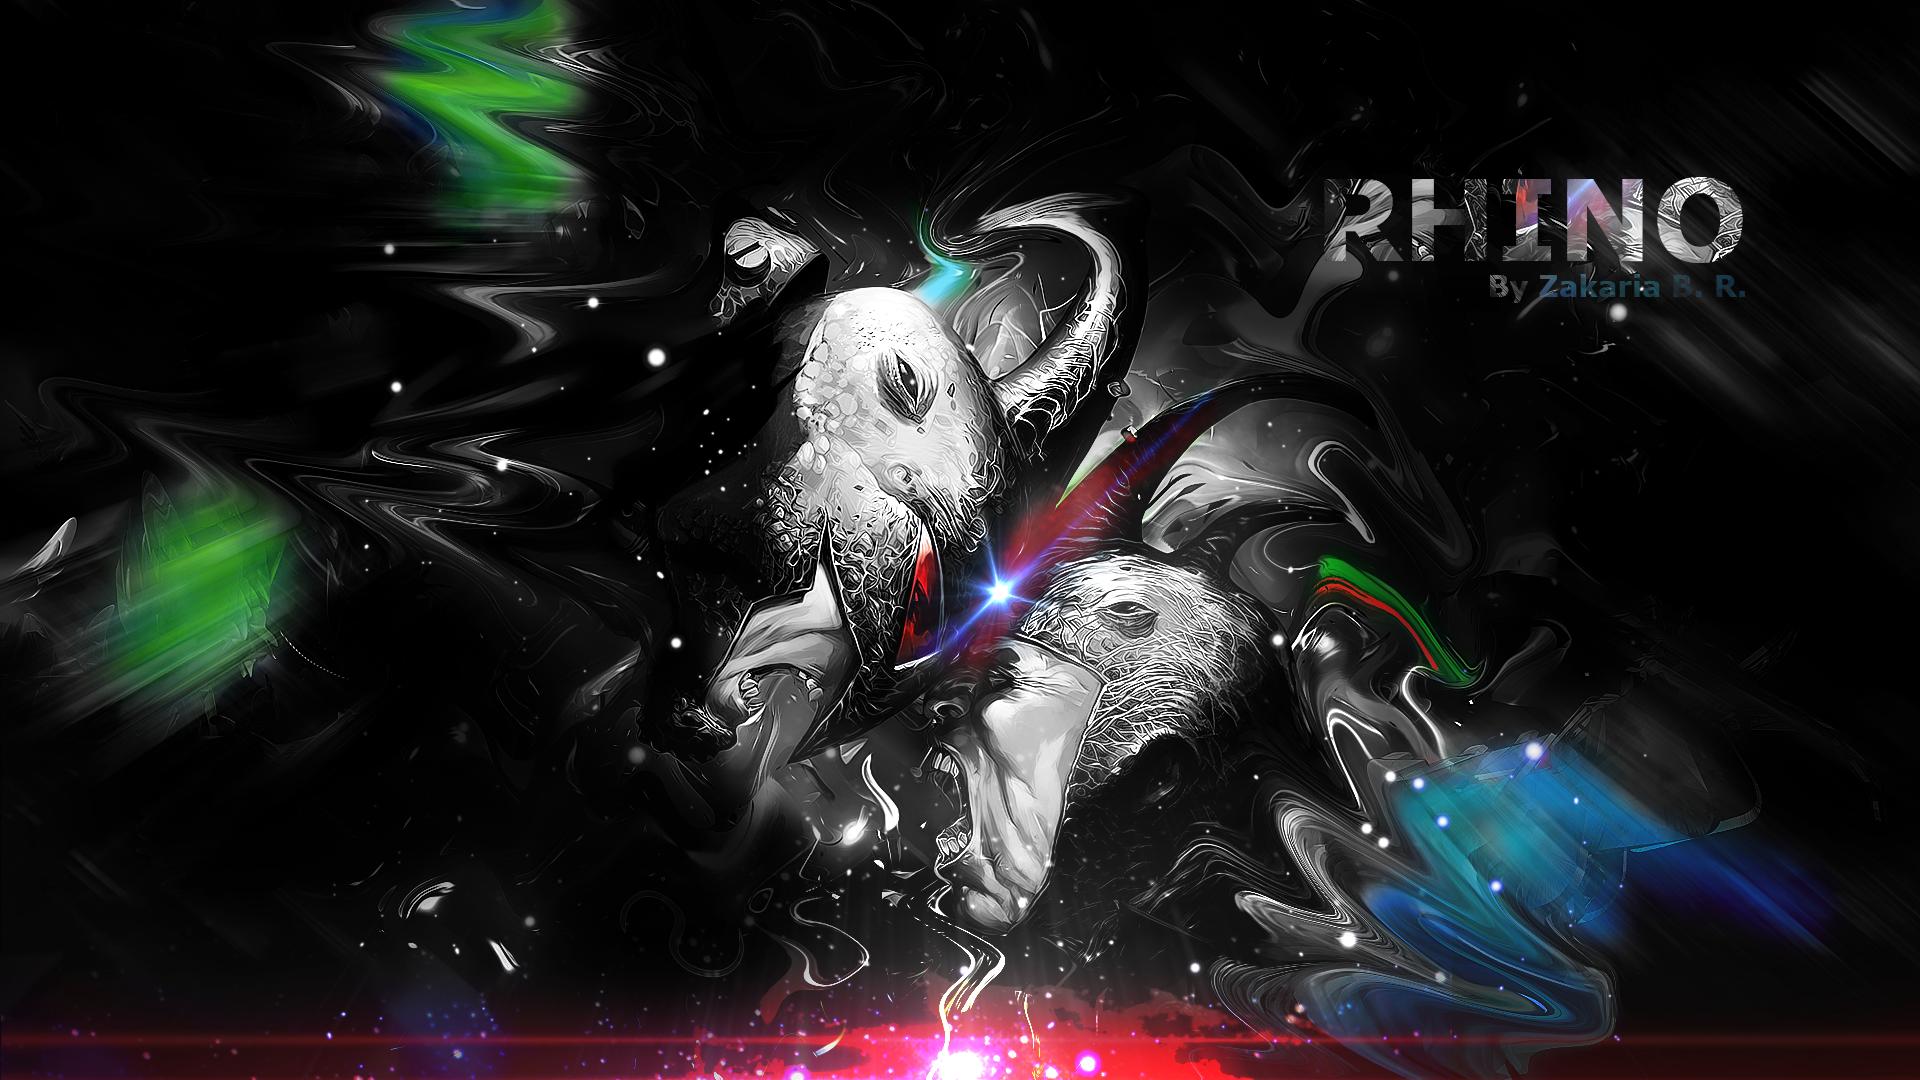 Amazing Wallpaper Marvel Deviantart - rhino___marvel_v2_by_z_designs-d57qrdm  2018_406471.png